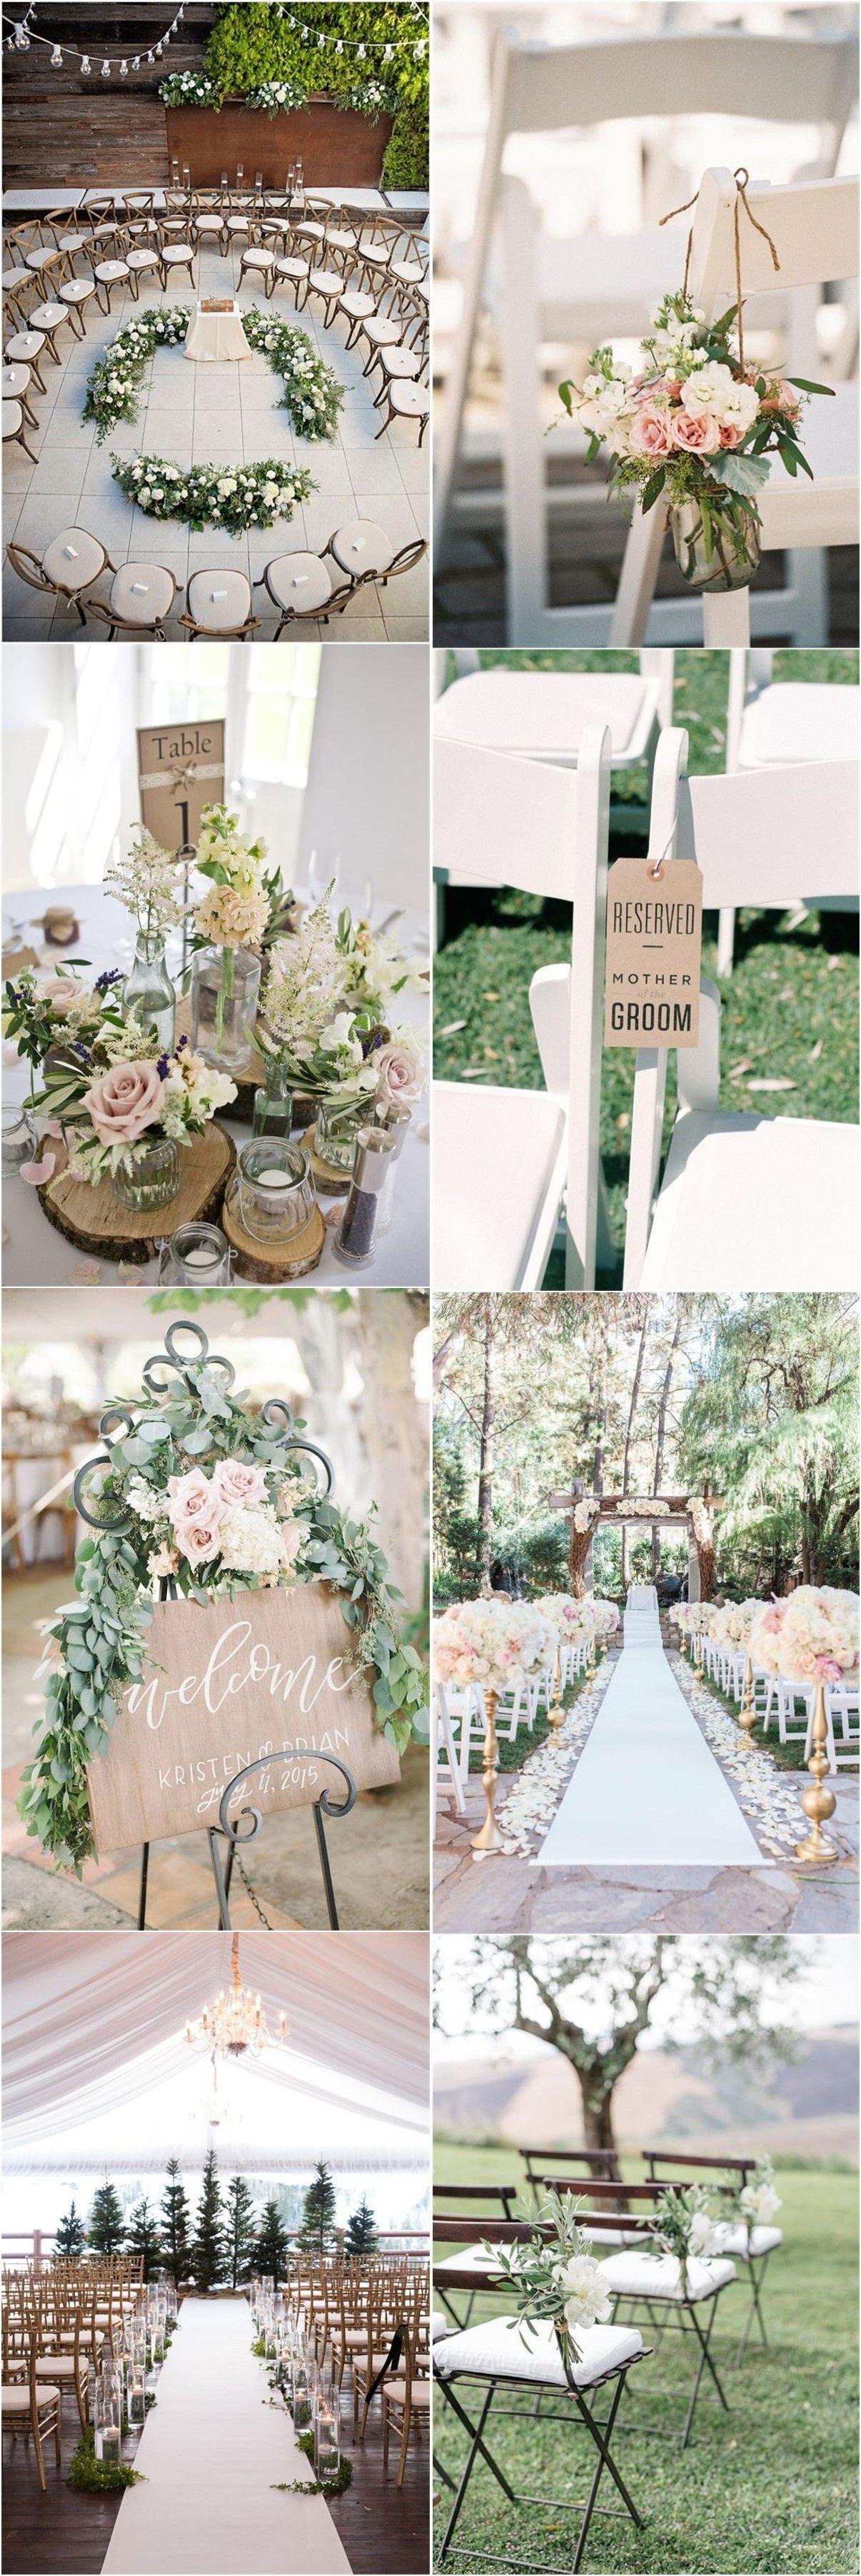 2017 06 registry office wedding vows examples - 25 Rustic Outdoor Wedding Ceremony Decorations Ideas